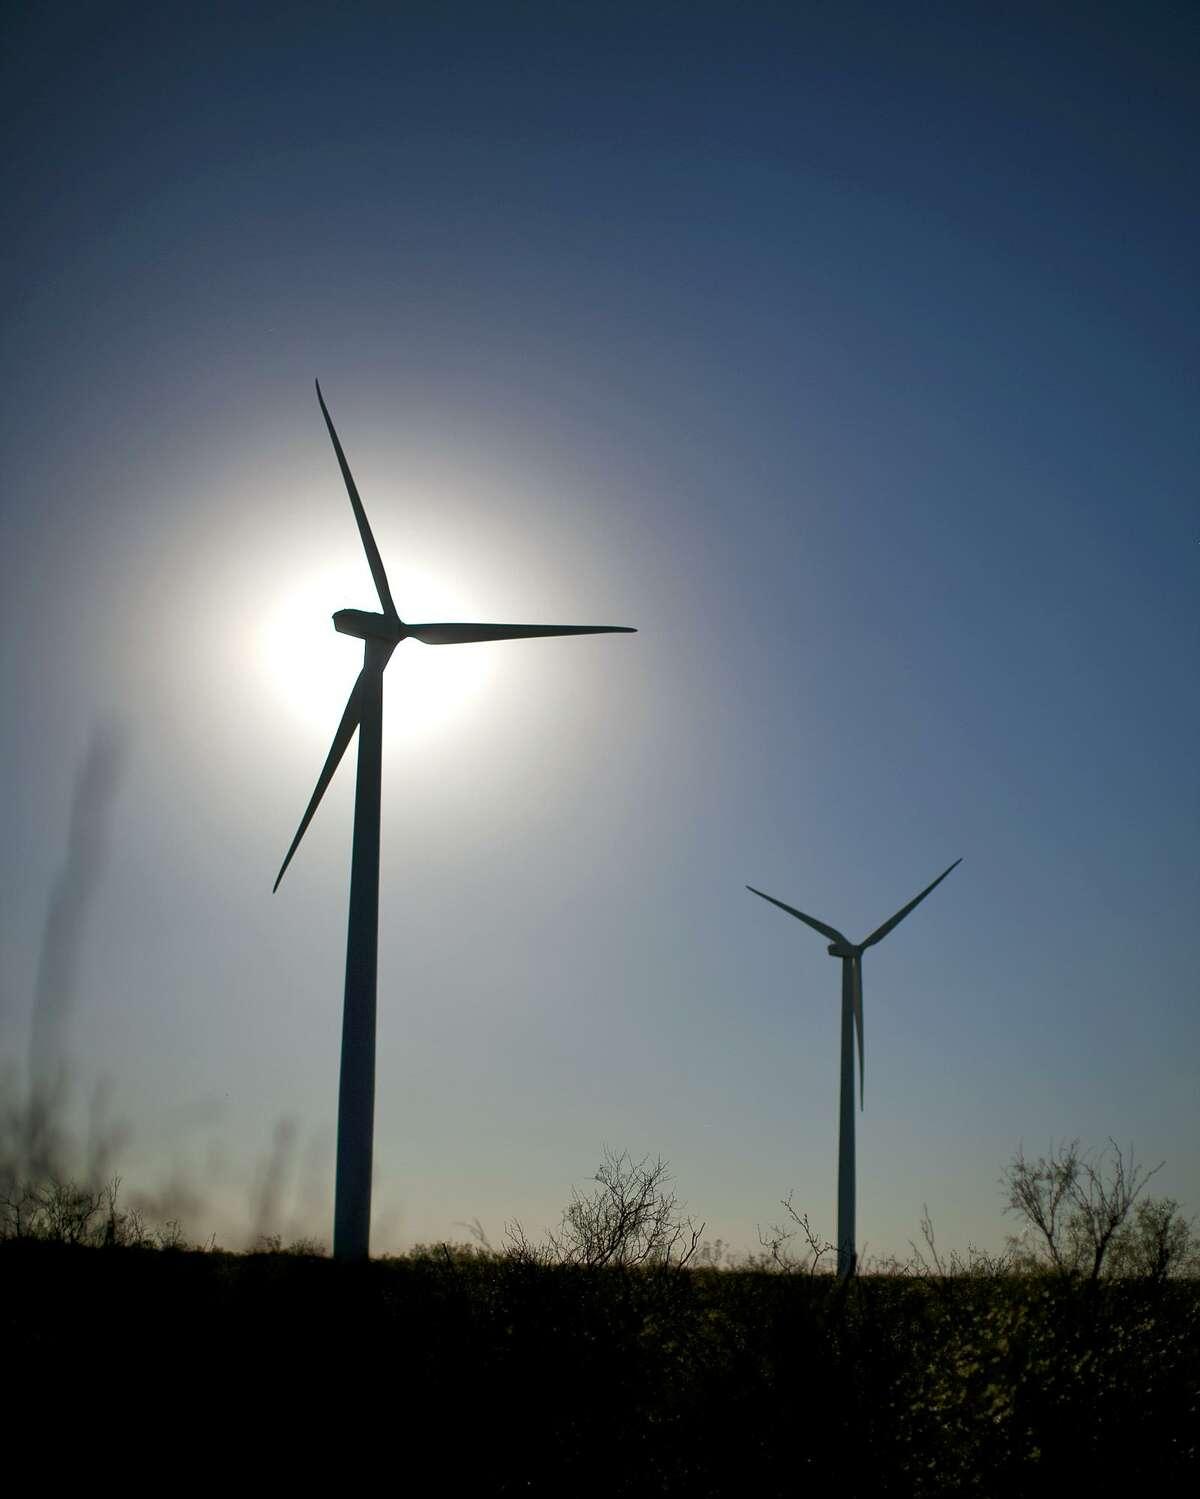 Wind turbines in action Tuesday, Oct. 27, 2015, north of Stanton, Texas. James Durbin/Reporter-Telegram